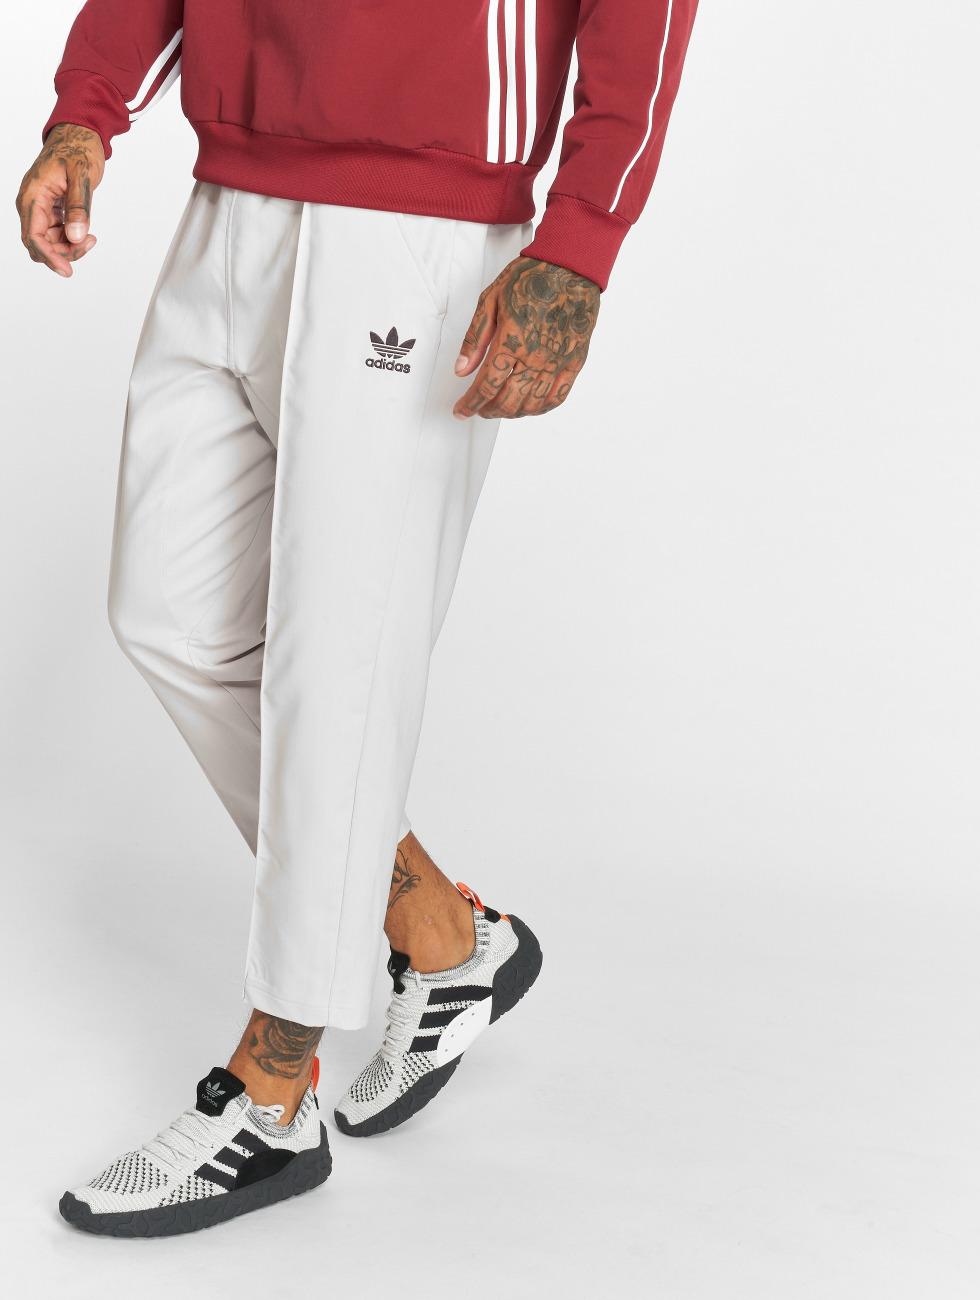 adidas originals Chino pants 7/8 beige